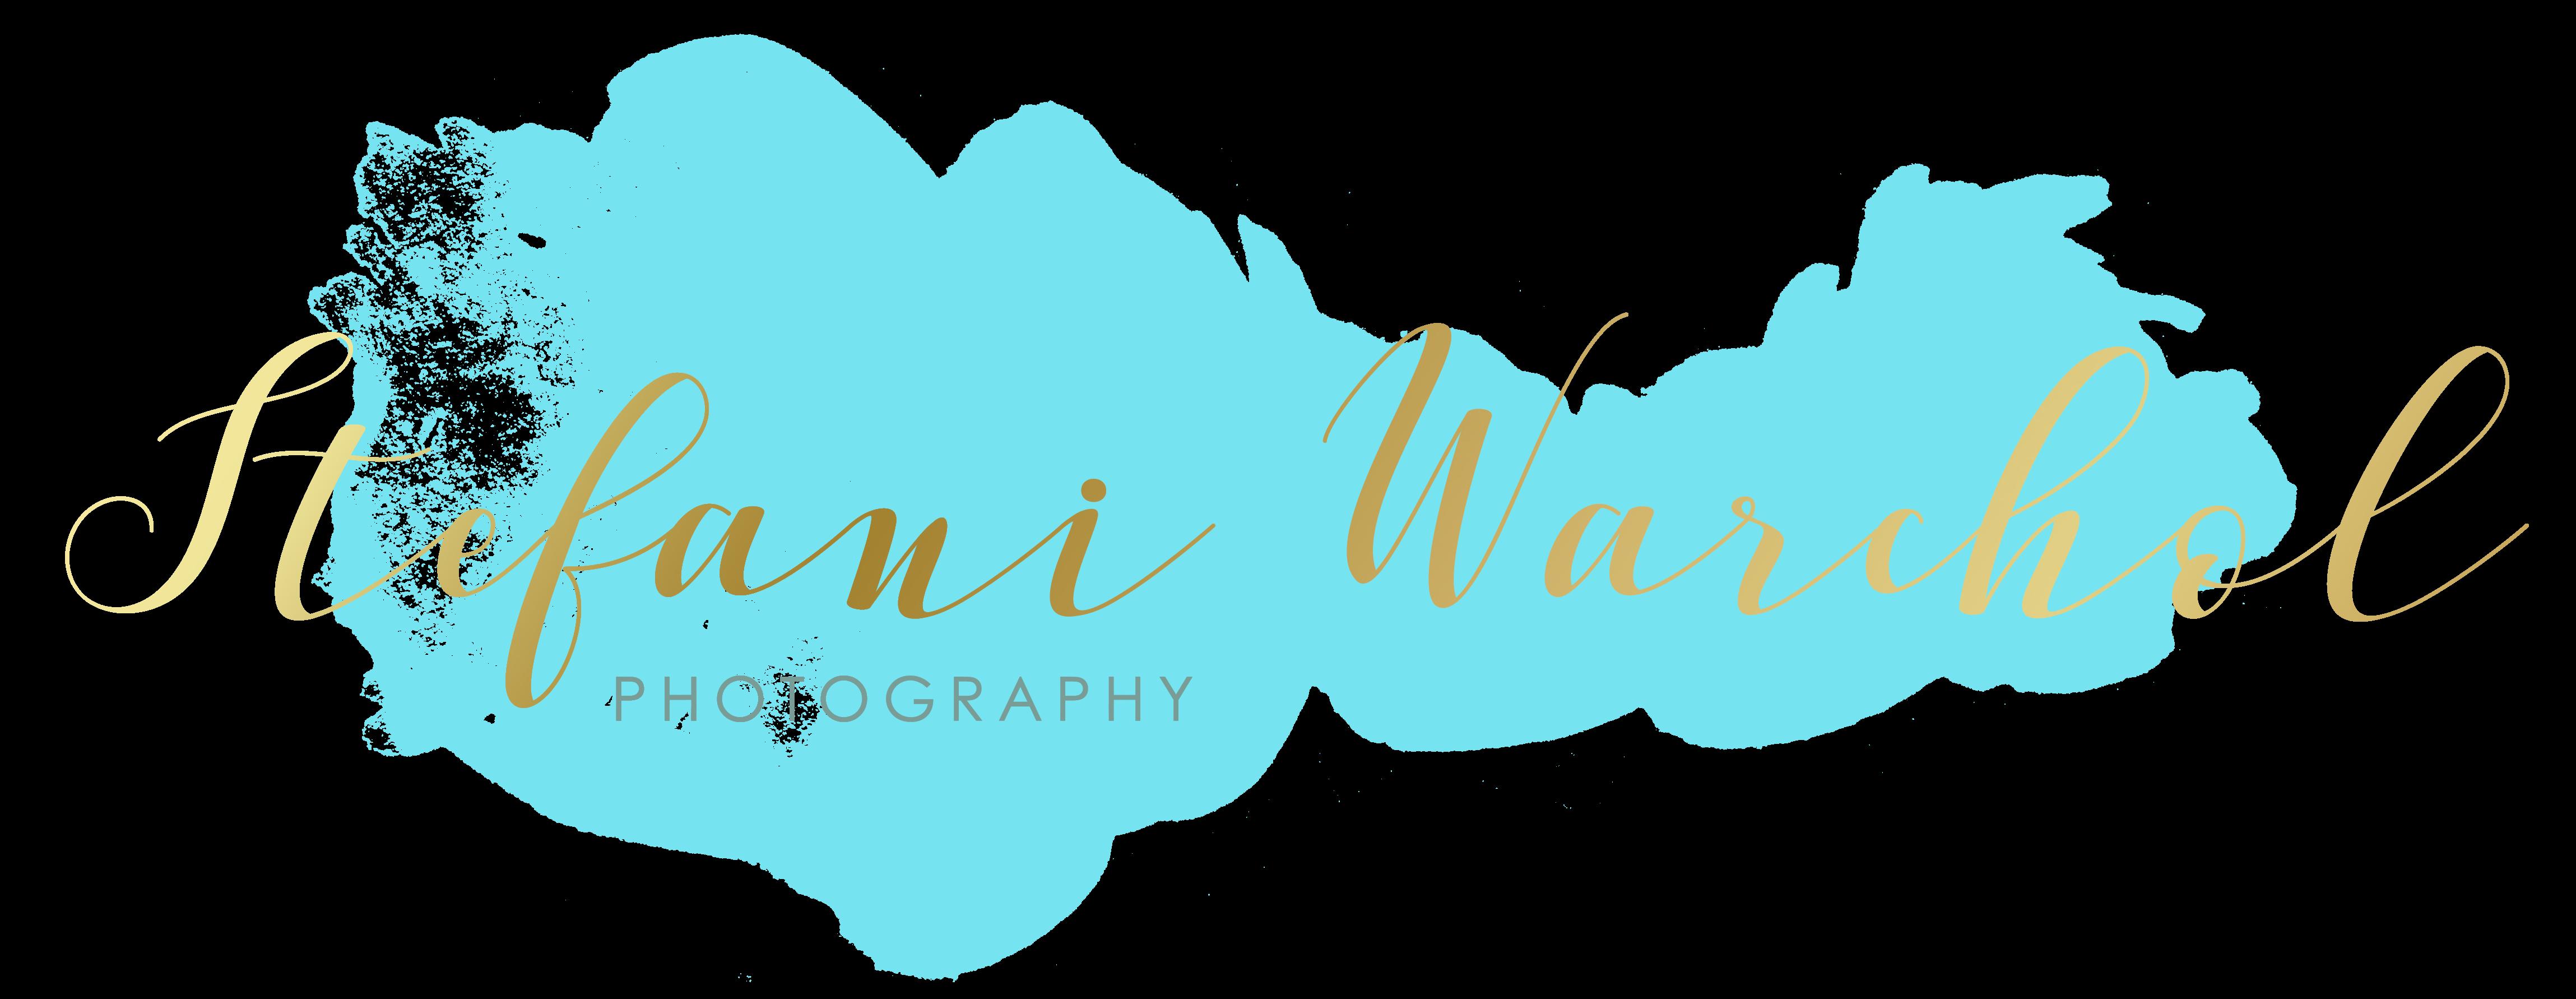 Stefani Warchol Photography